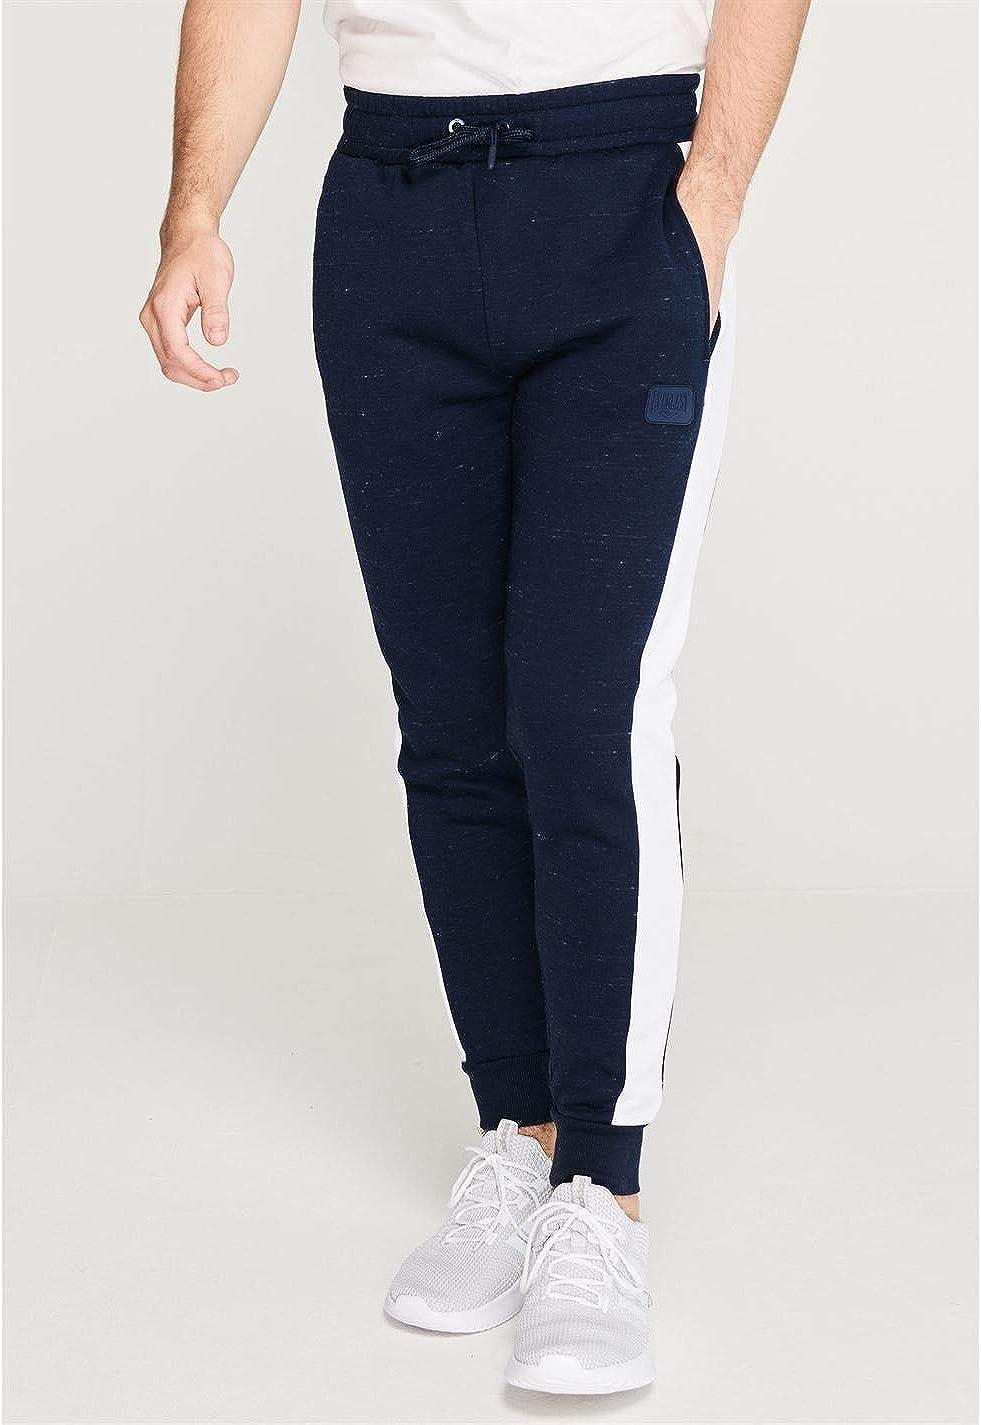 Everlast Mens Bronx Jogging Bottoms Sports Training Trousers Pants Pockets